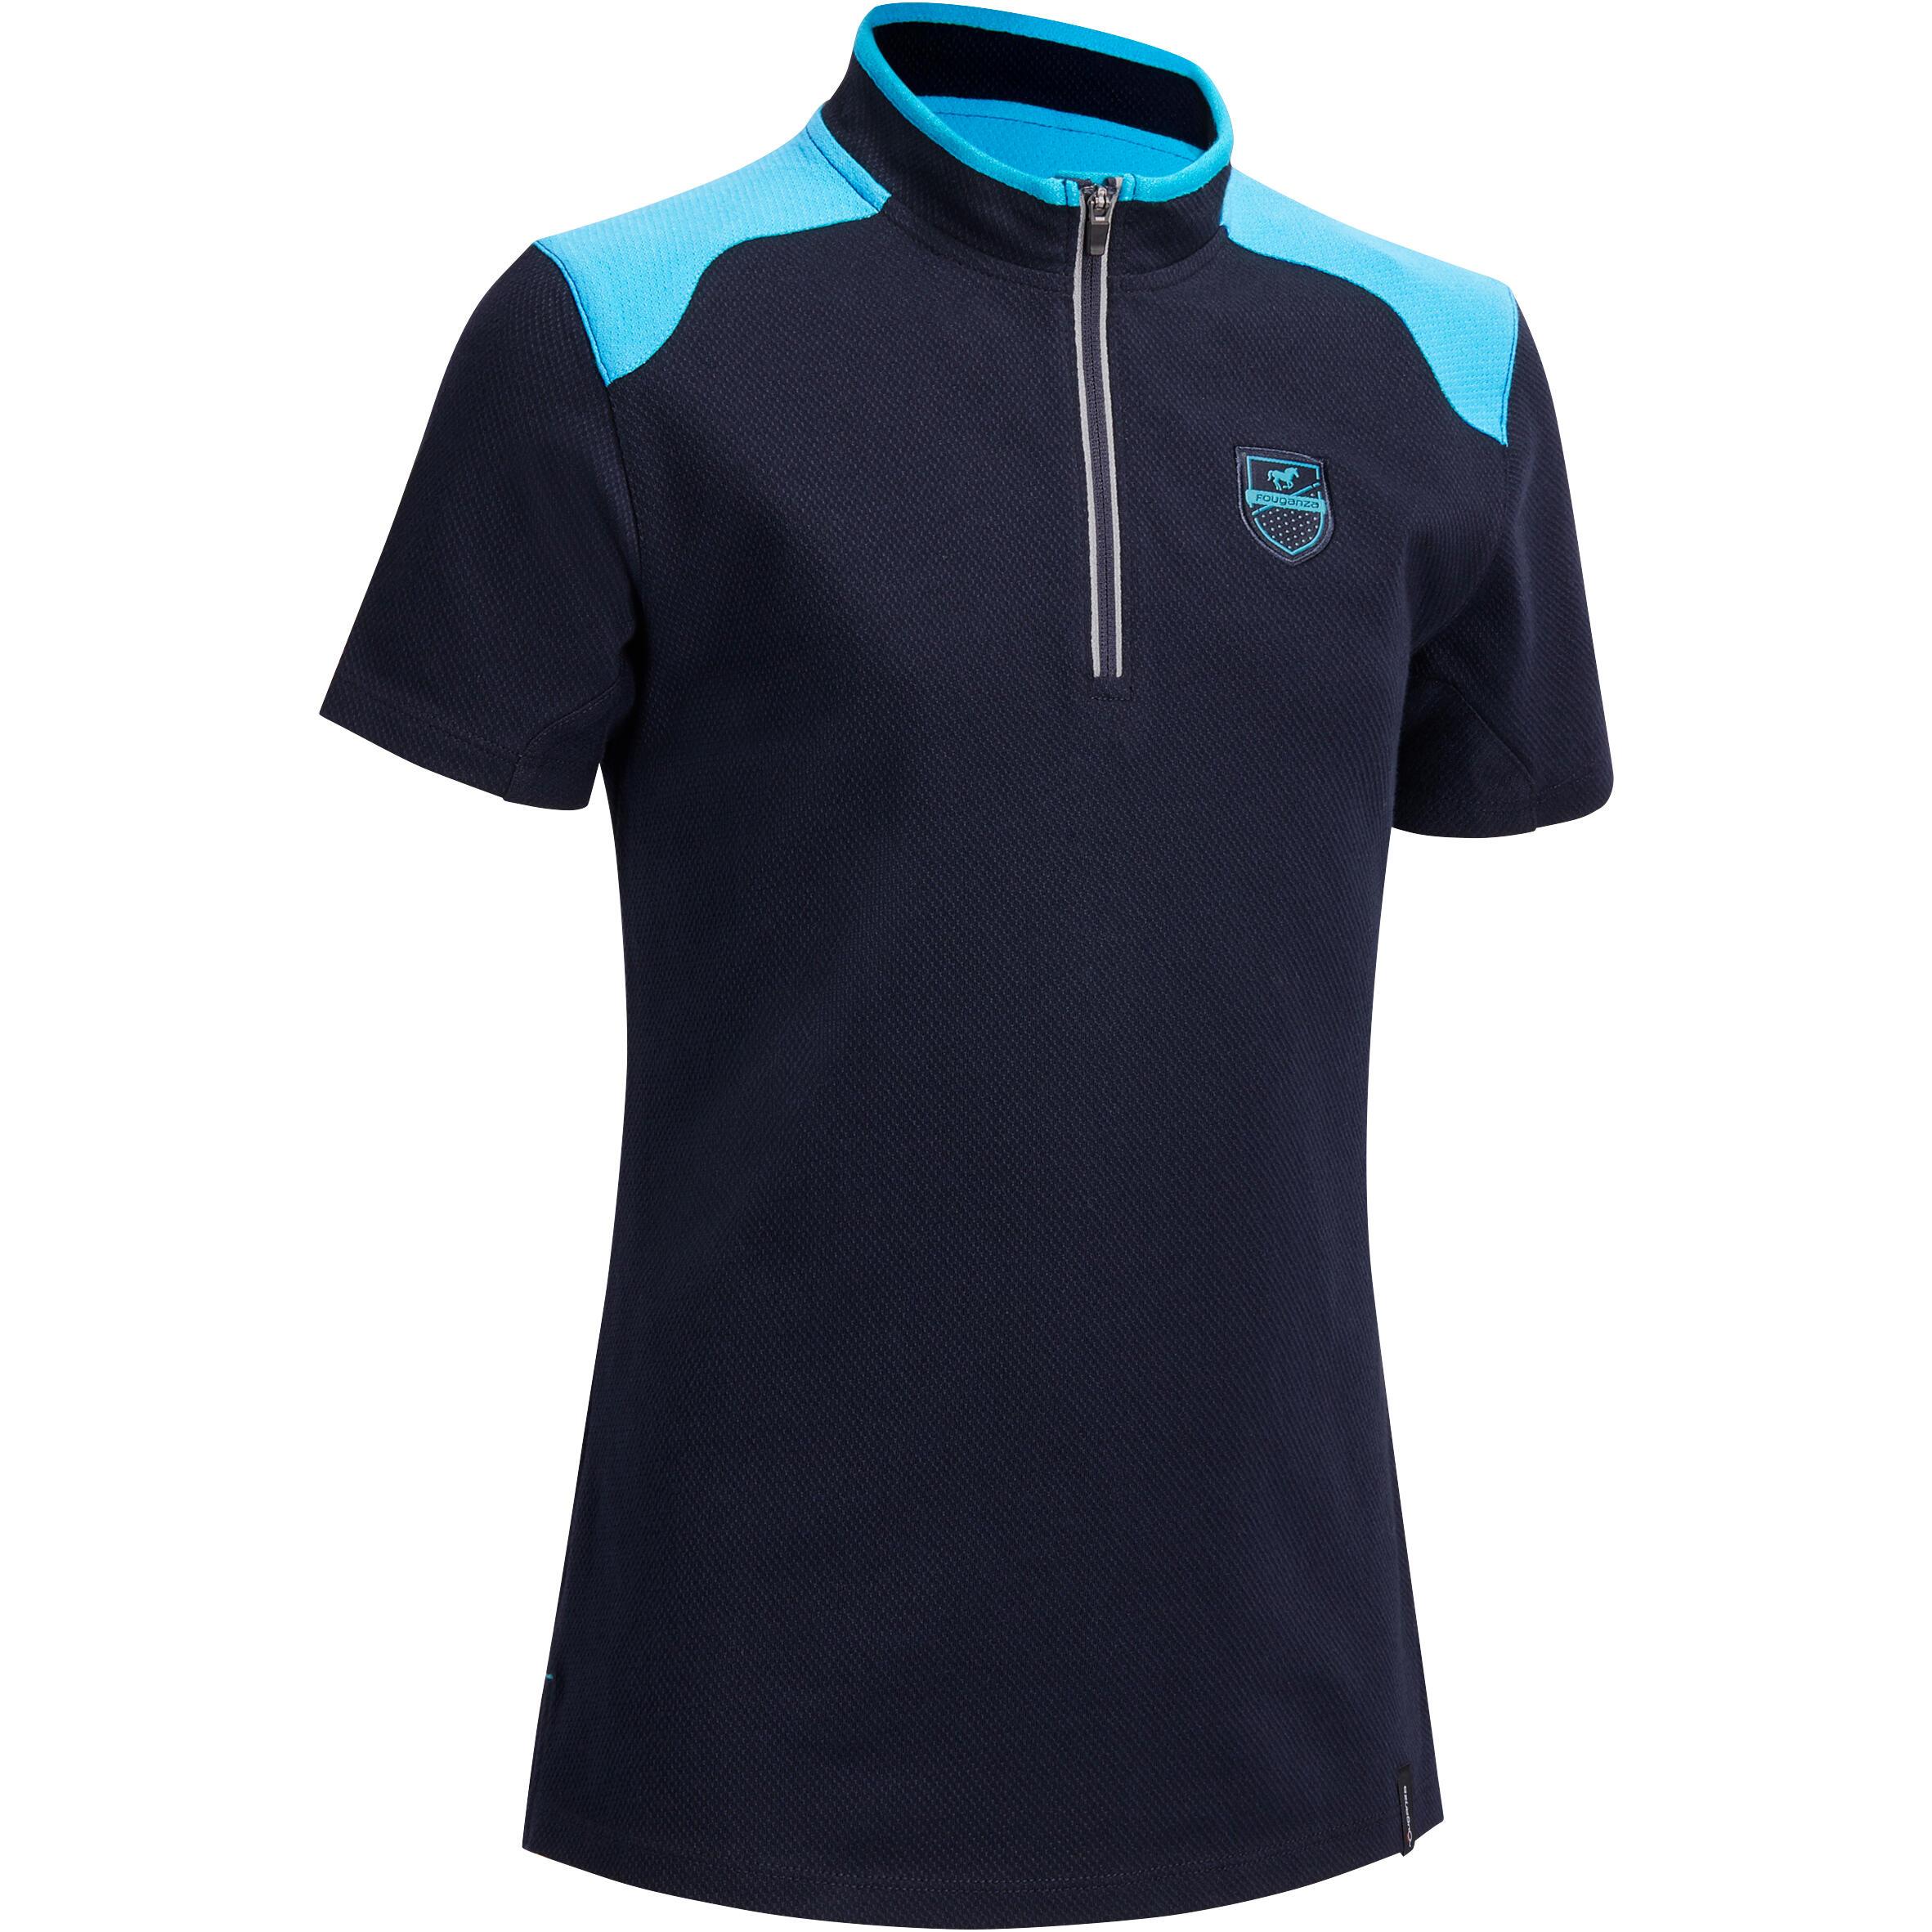 Fouganza Polo korte mouwen ruitersport meisjes PL500 marineblauw/turquoise